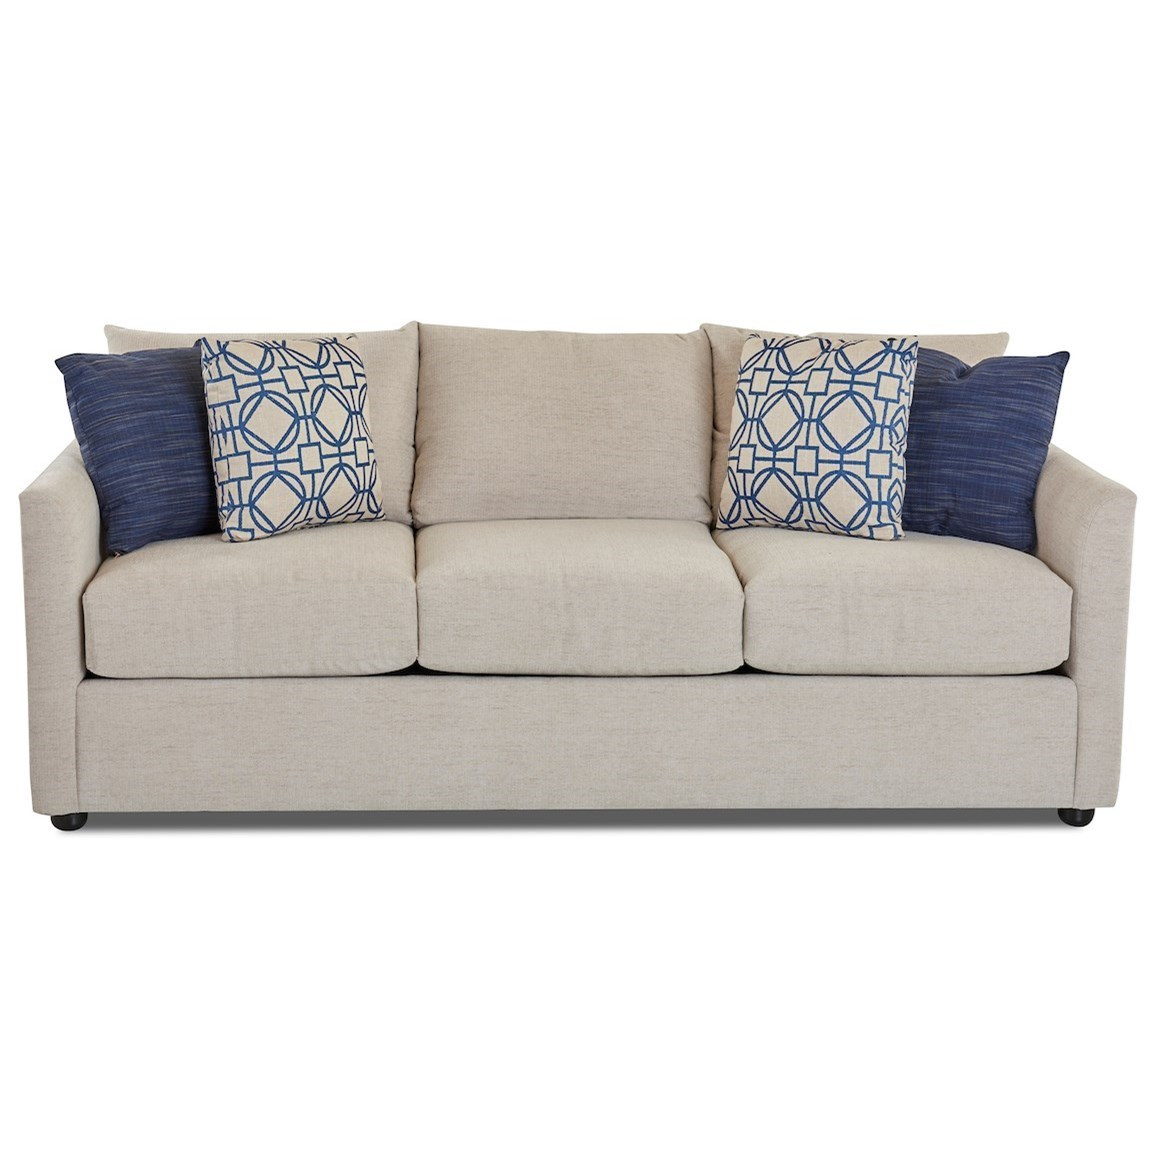 Atlanta Sleeper Sofa w/ Innerspring Mattress by Klaussner at Northeast Factory Direct